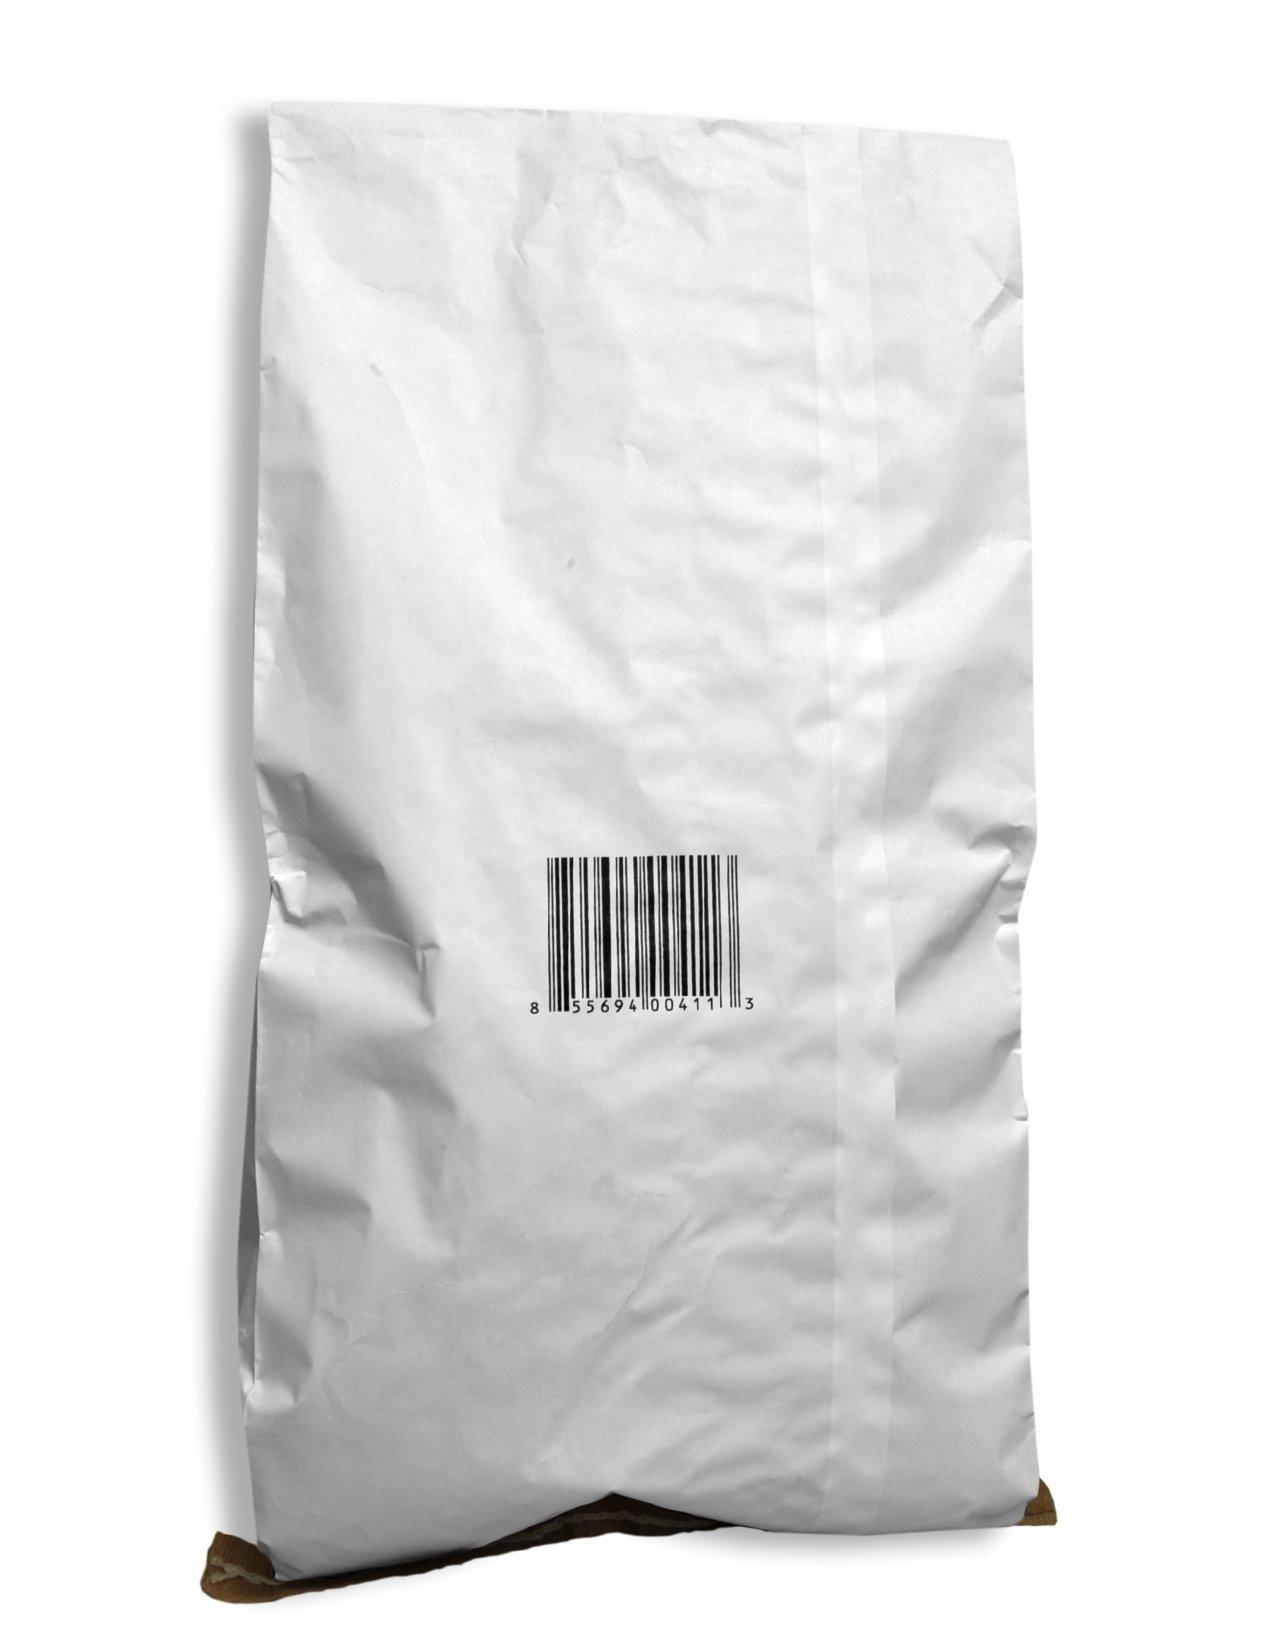 Royal Organic Red OA Quinoa (25 Lb bag) by OA QUINOA (Image #1)